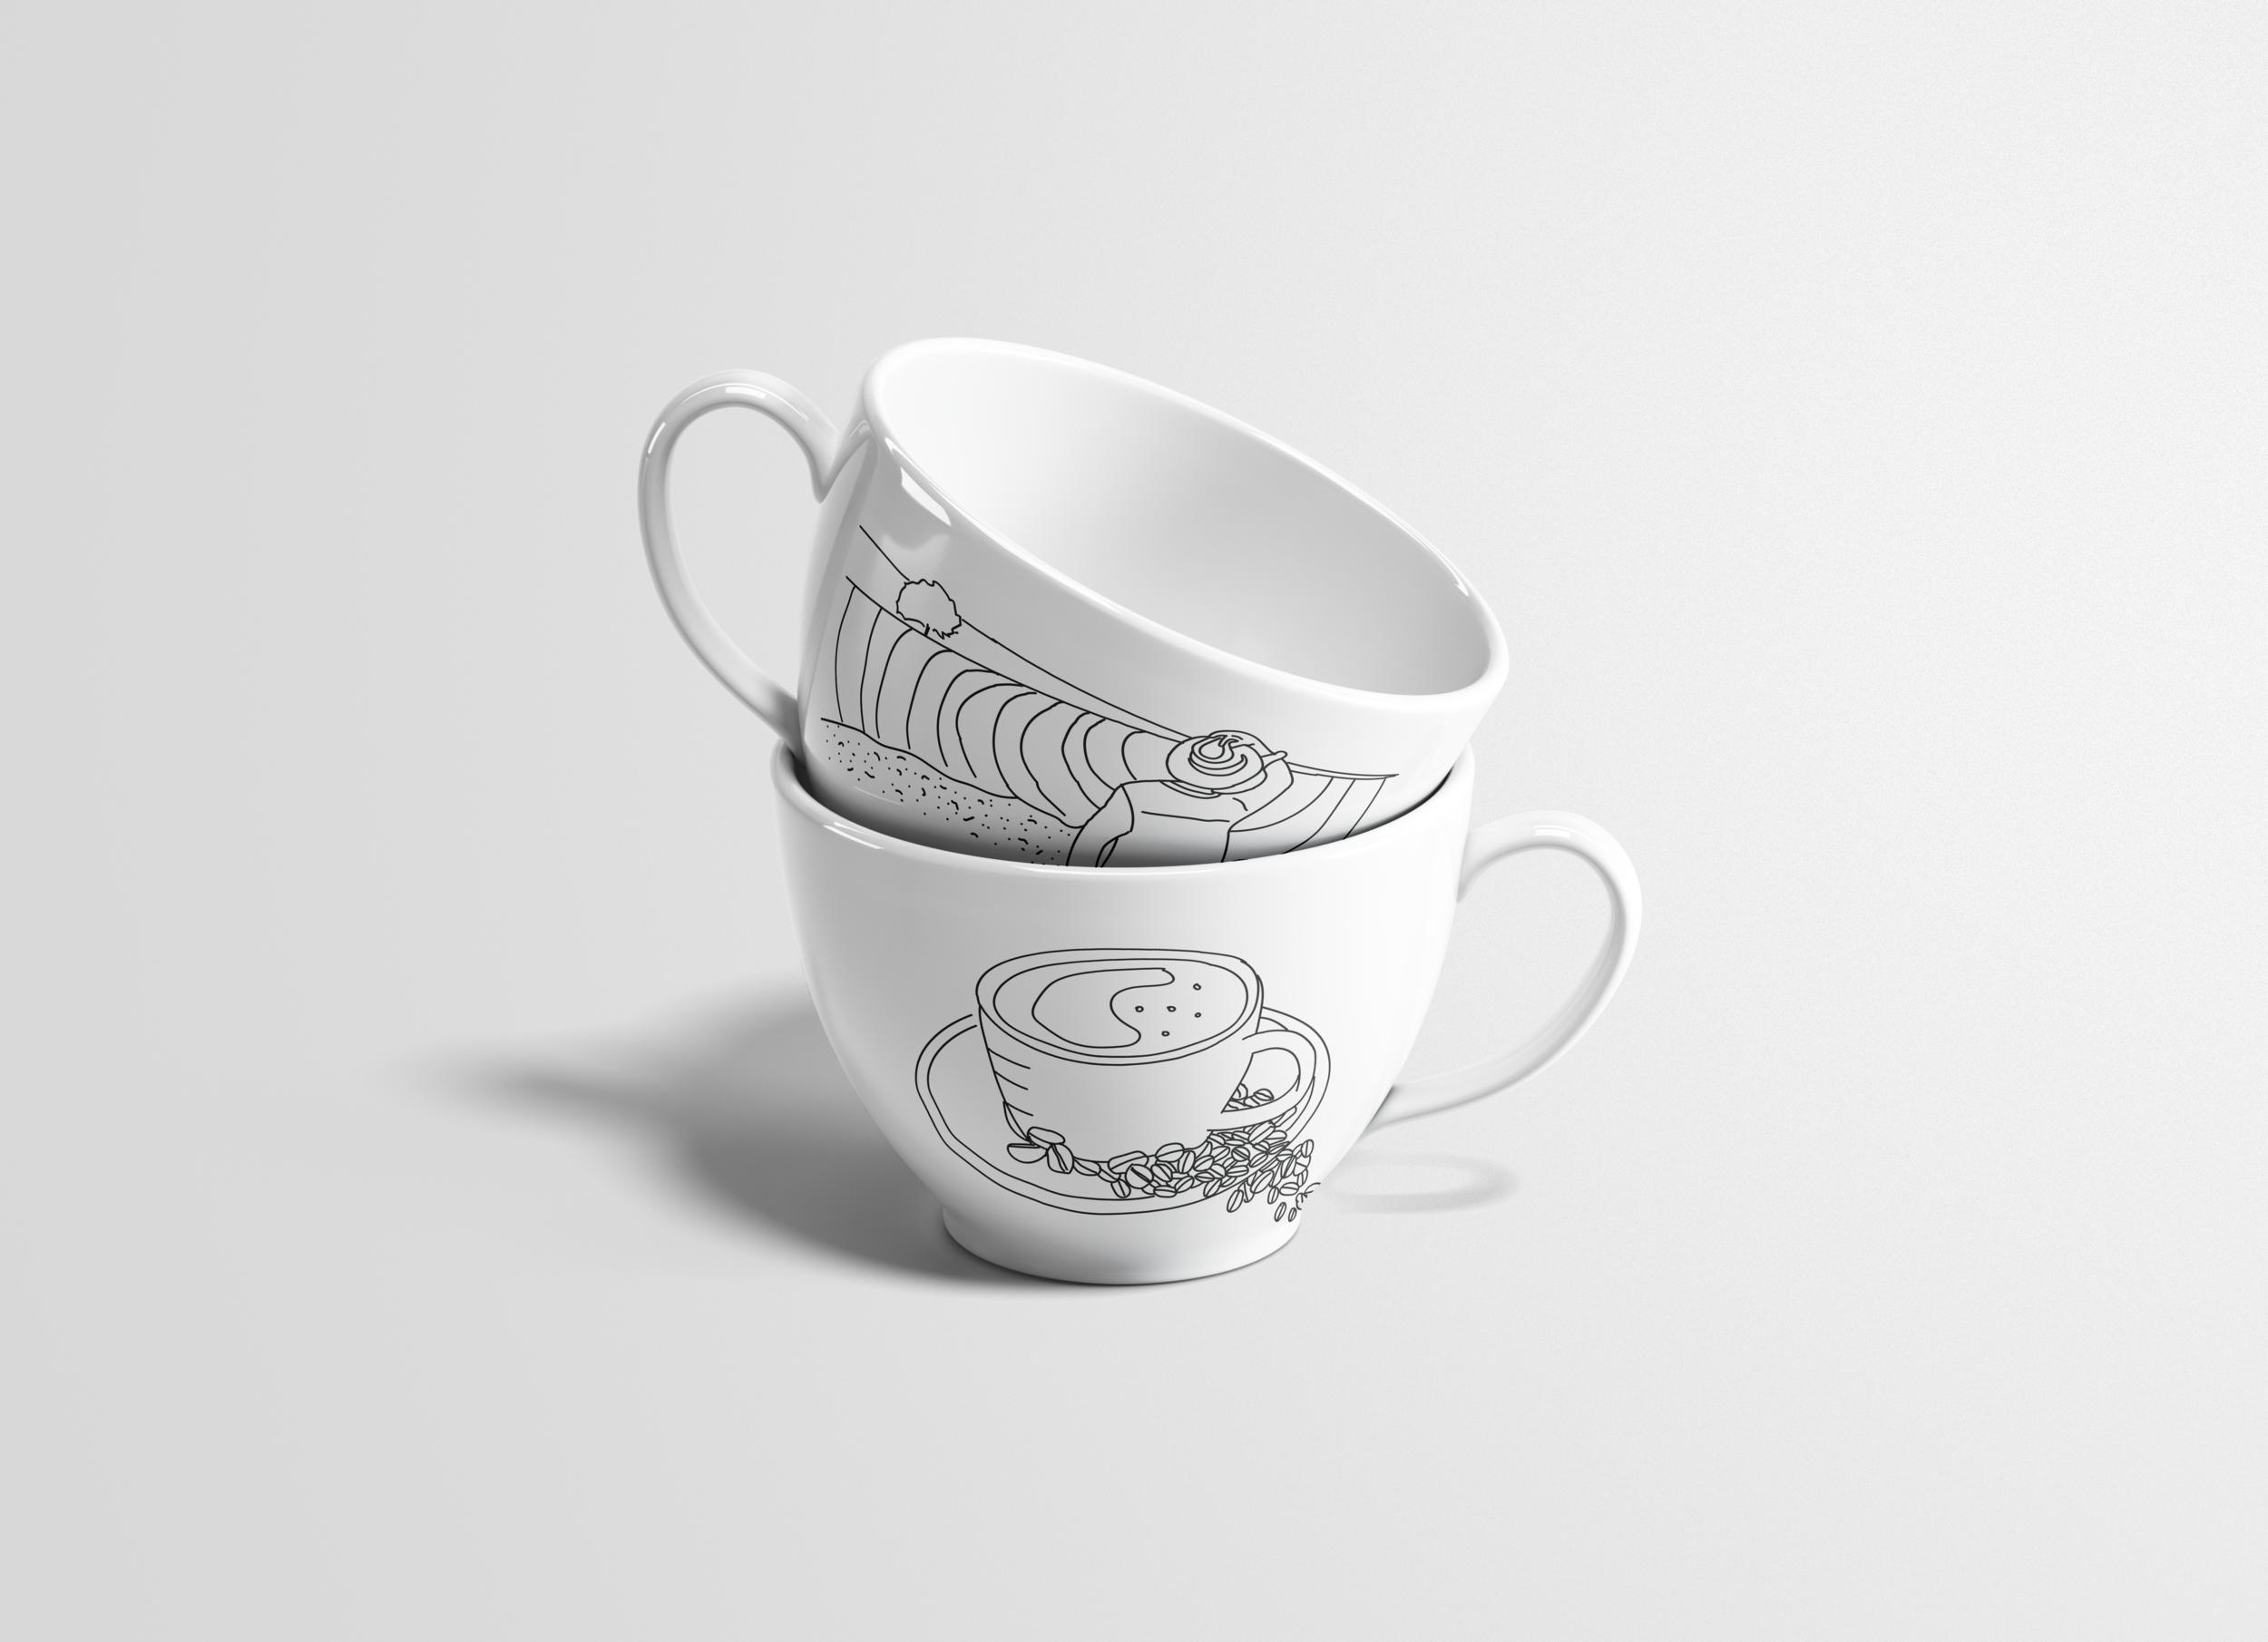 Zio Coffee - Branding, Illustration